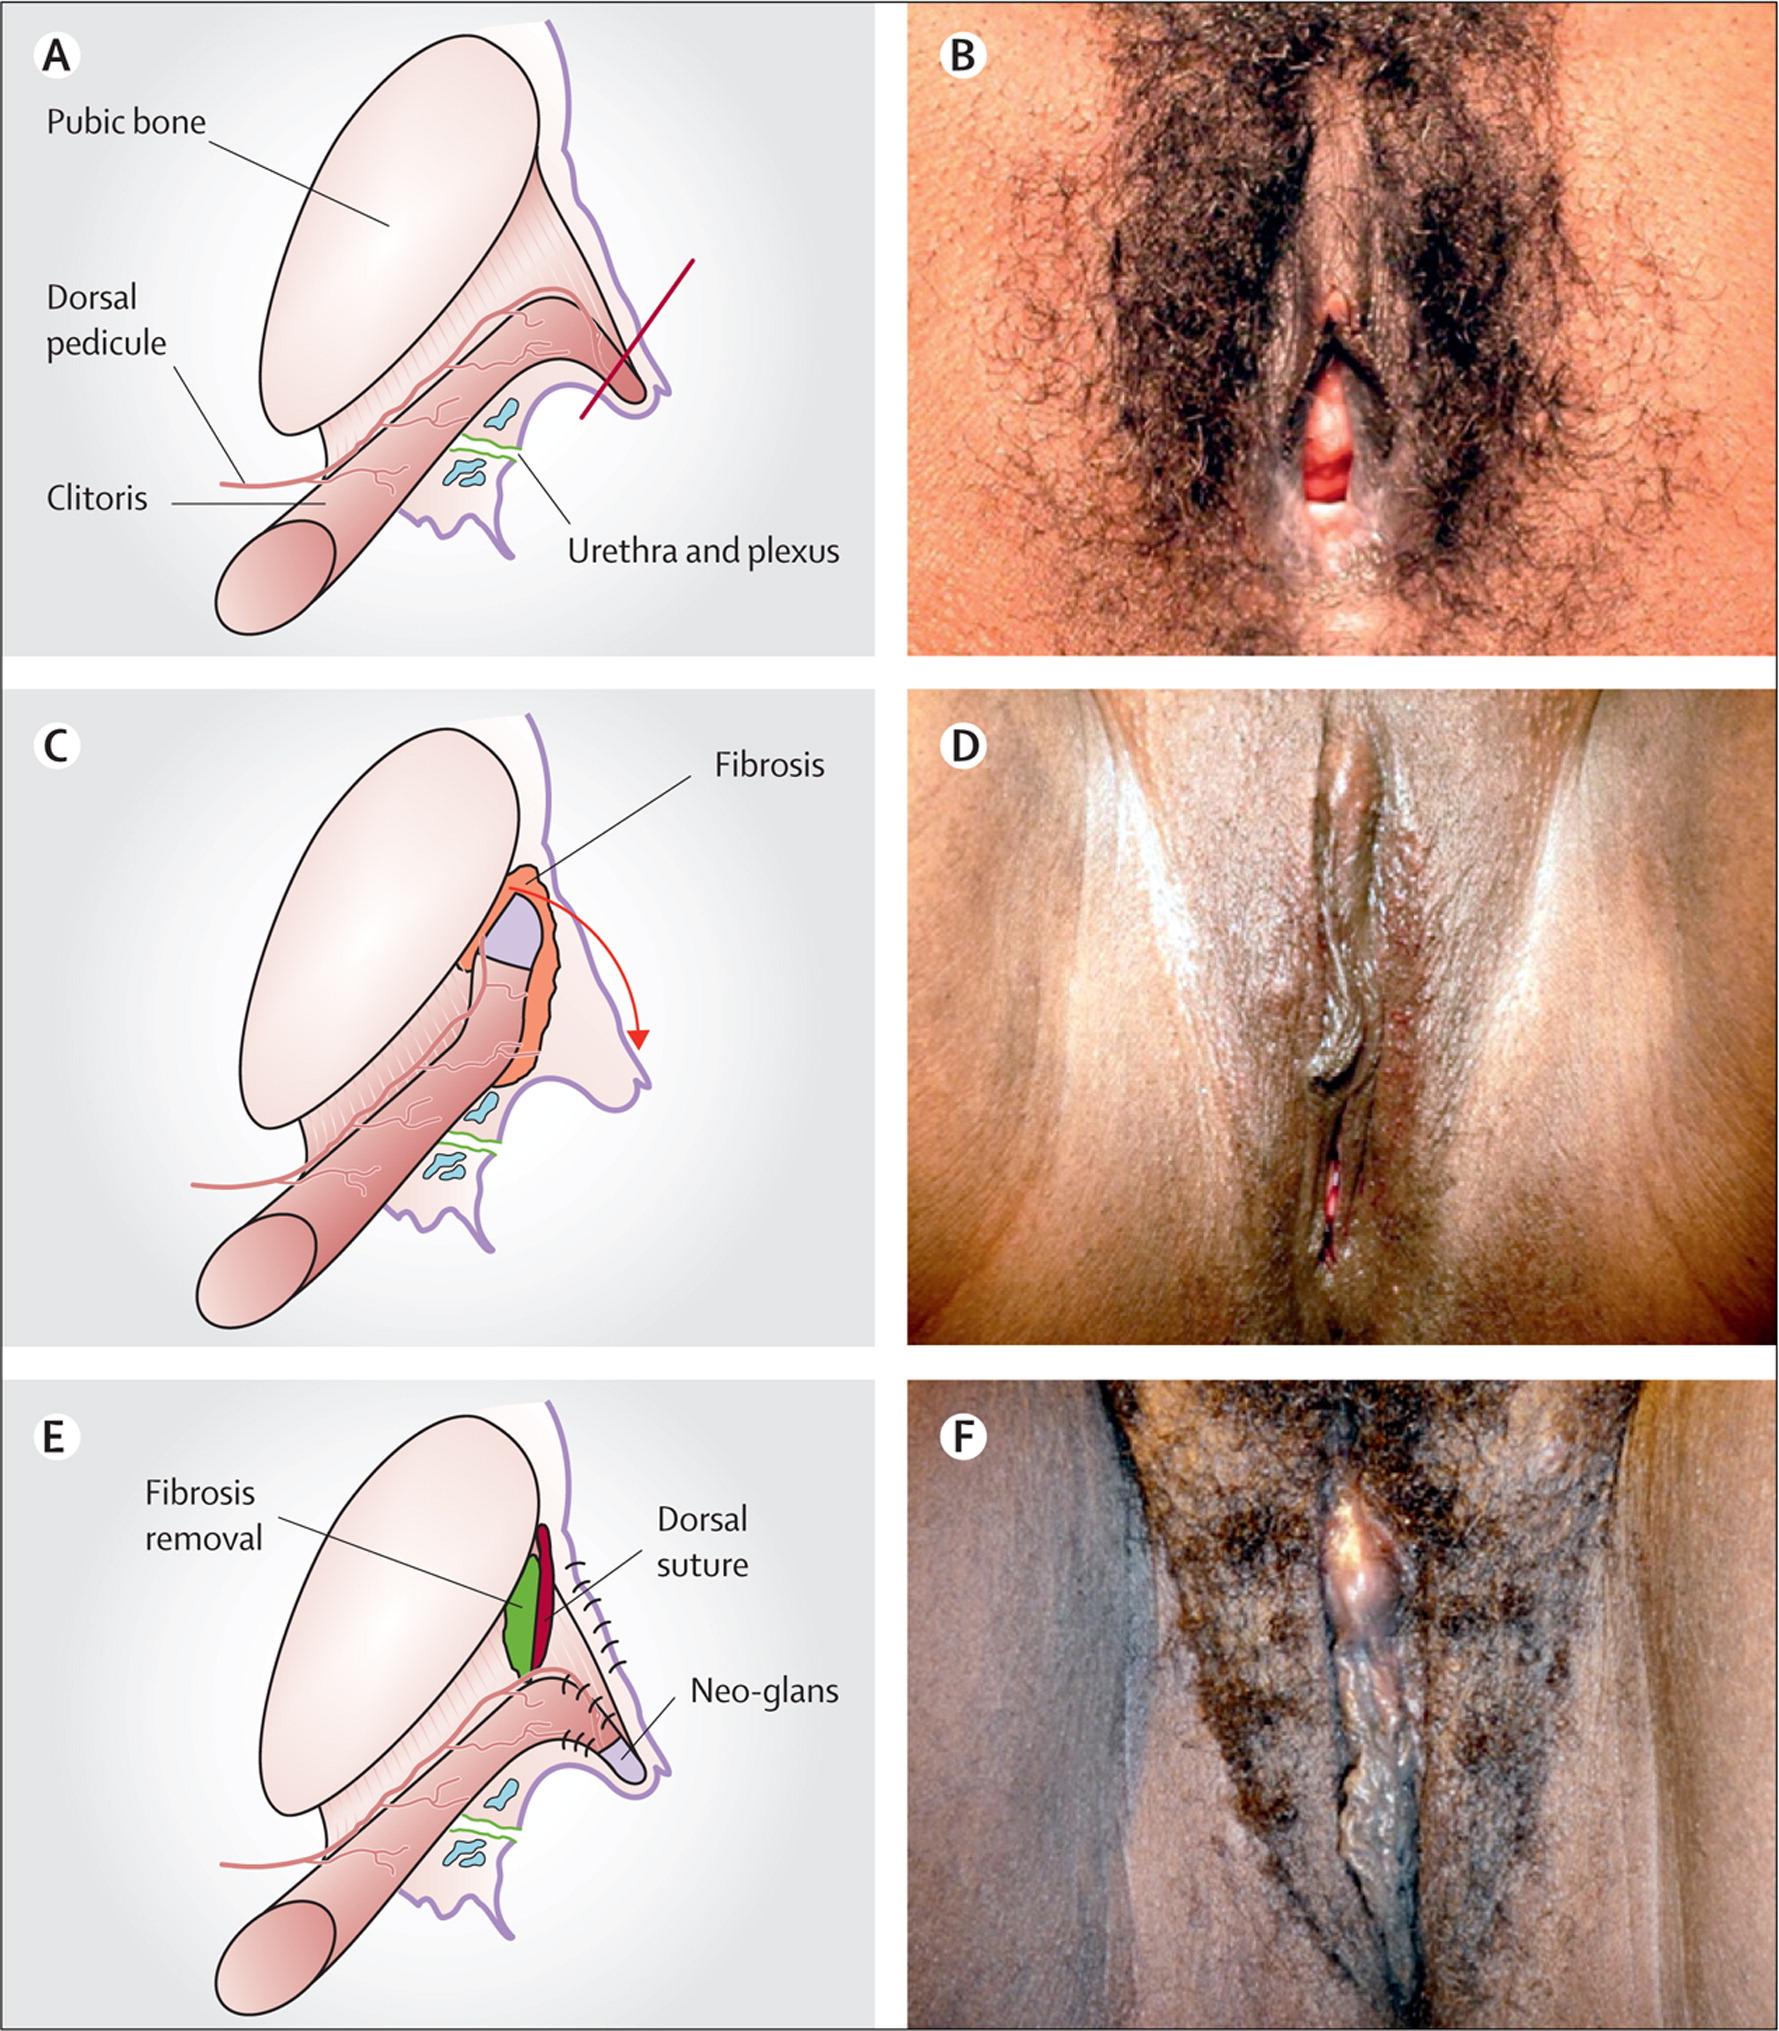 female genital mutilation after